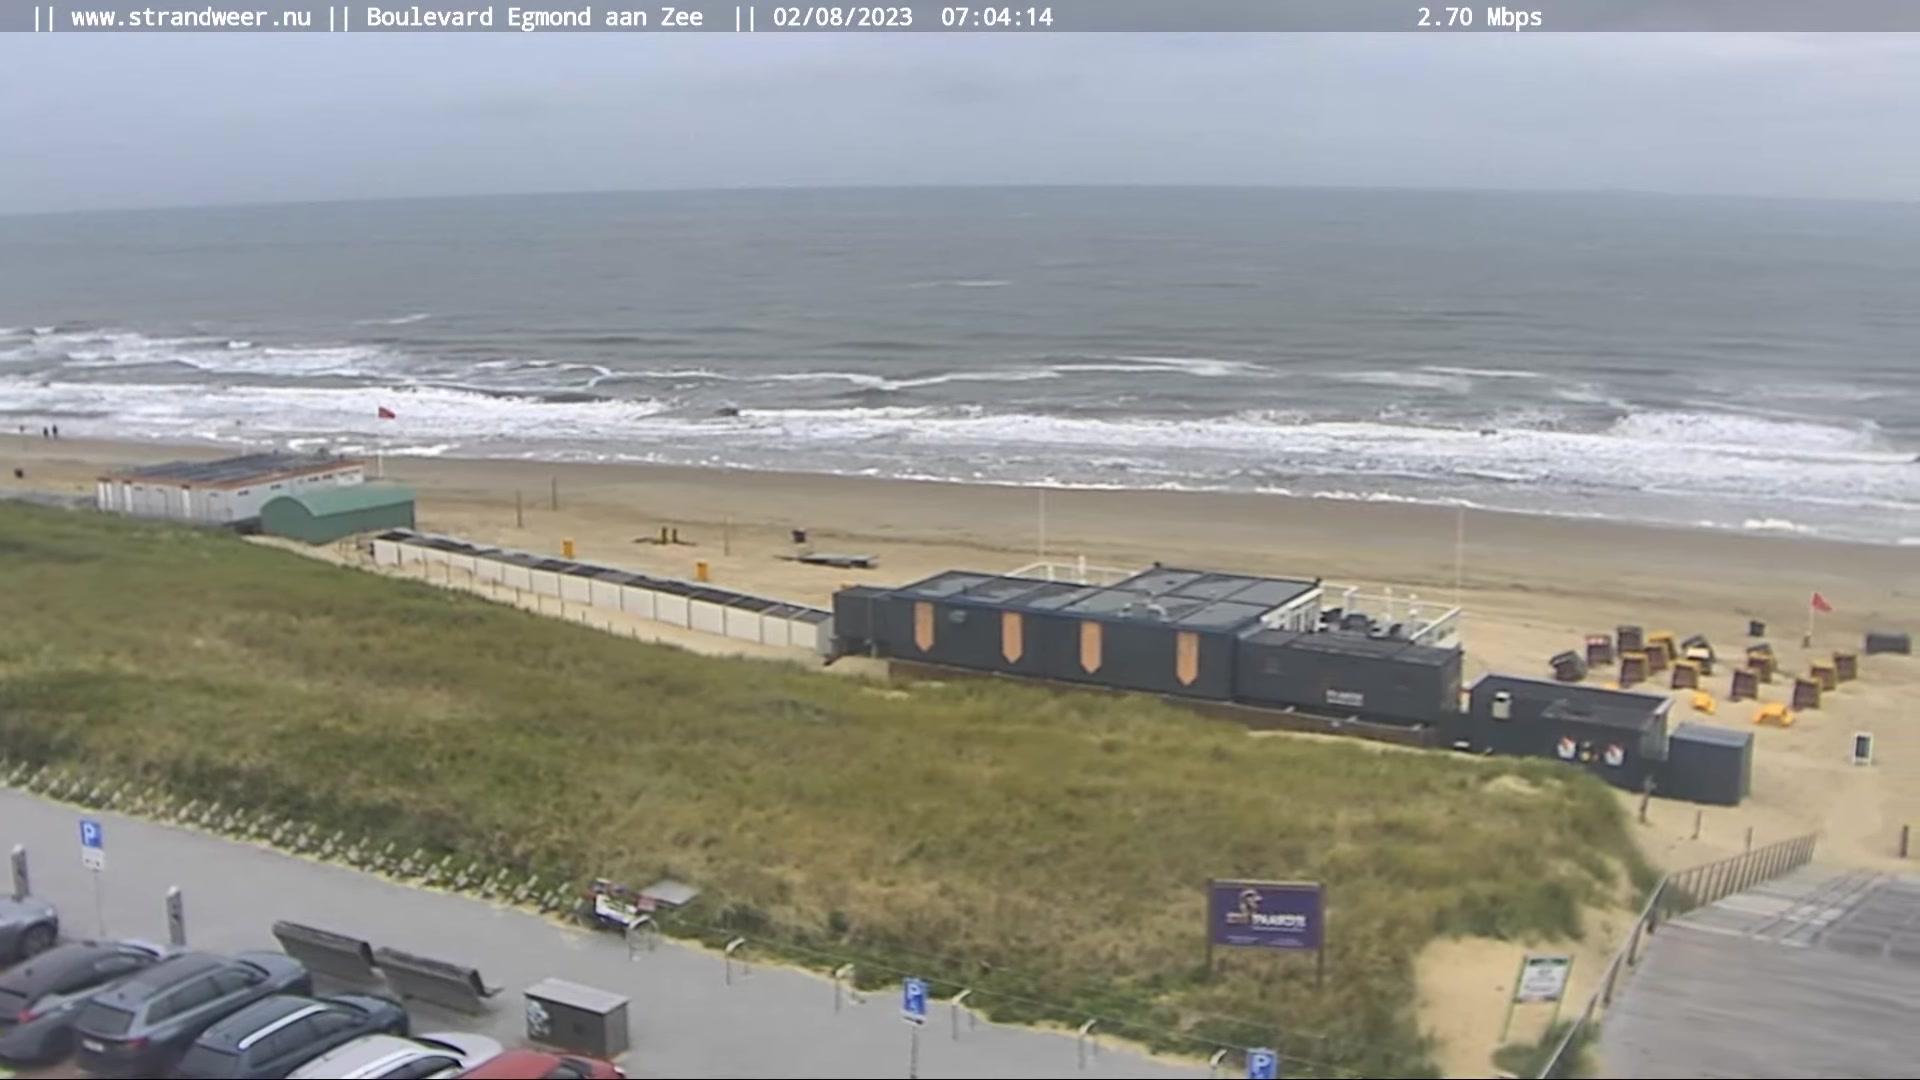 Webkamera Egmond aan Zee: Beach